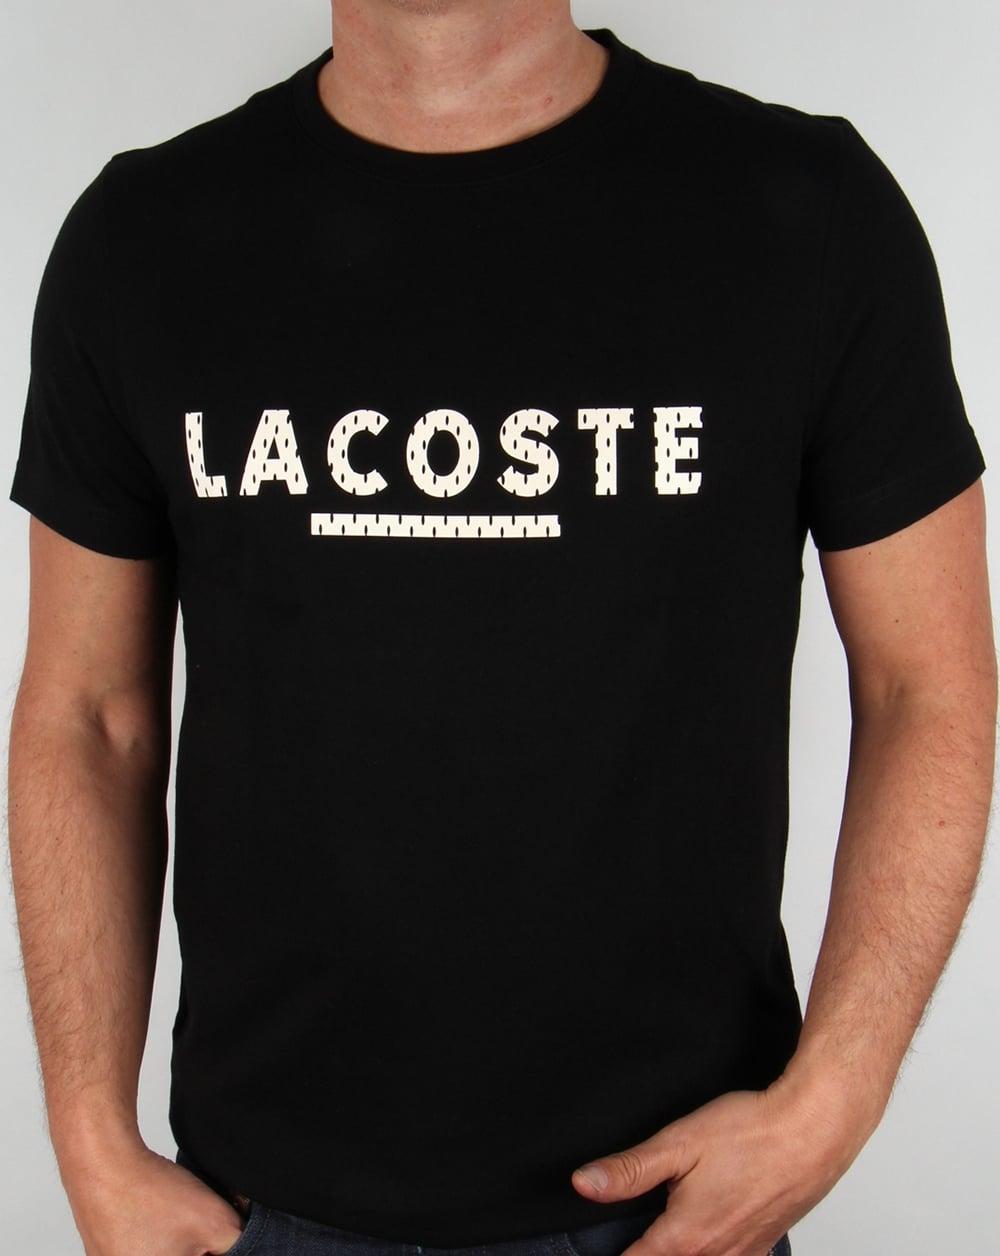 lacoste lettering logo t shirt black mens tee crew neck. Black Bedroom Furniture Sets. Home Design Ideas